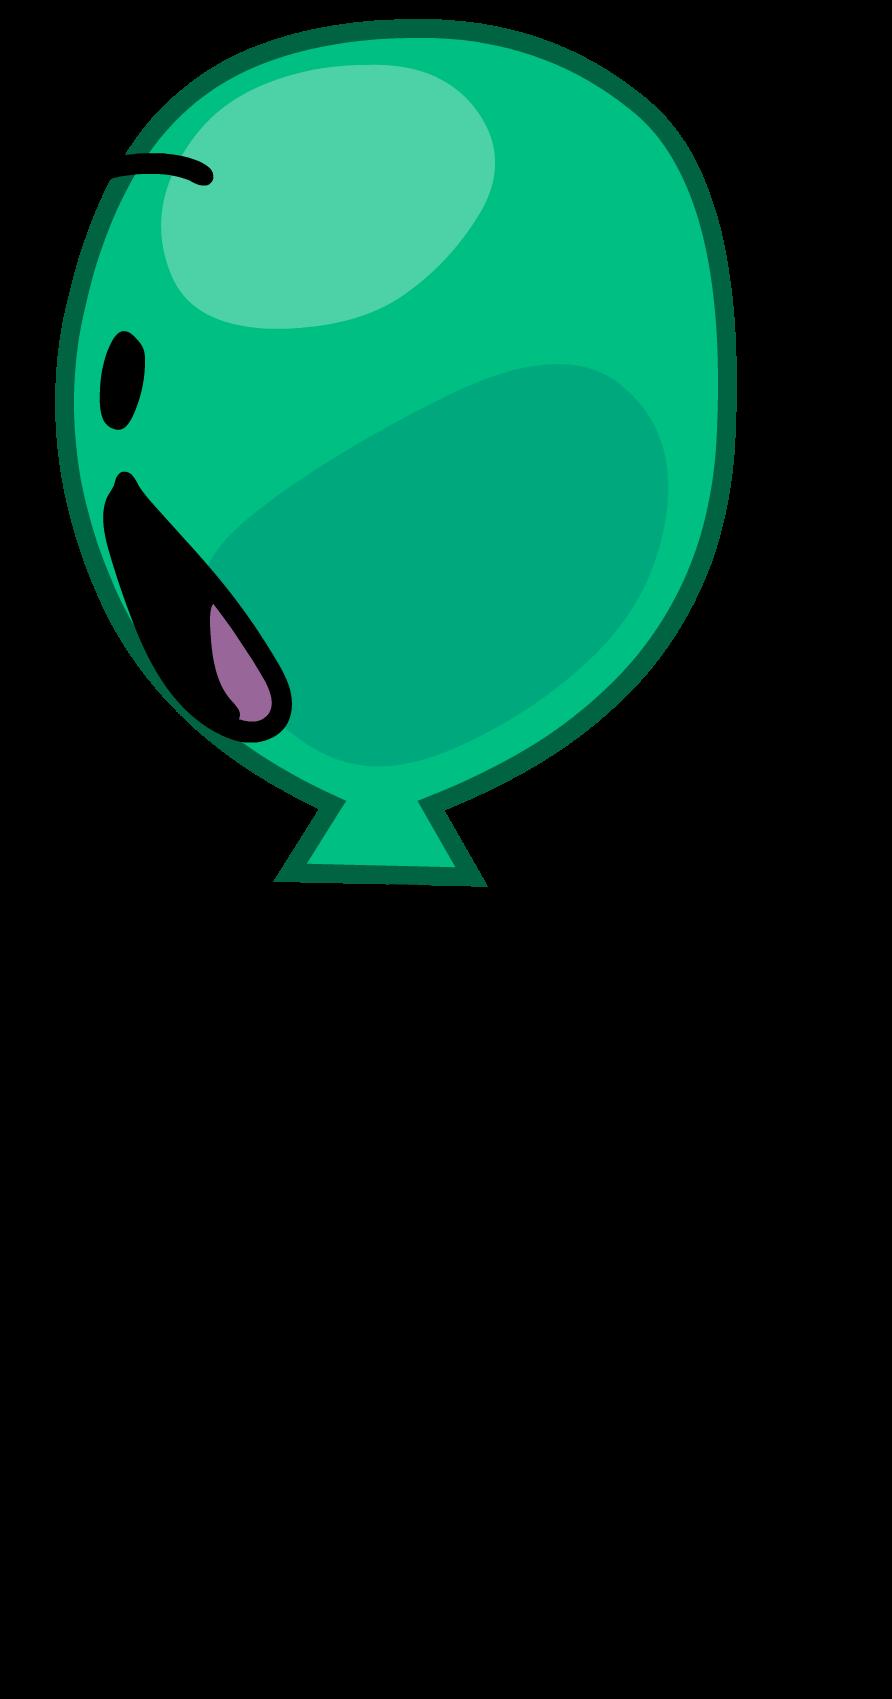 Balloony | Battle for Dream Island Wiki | FANDOM powered by Wikia